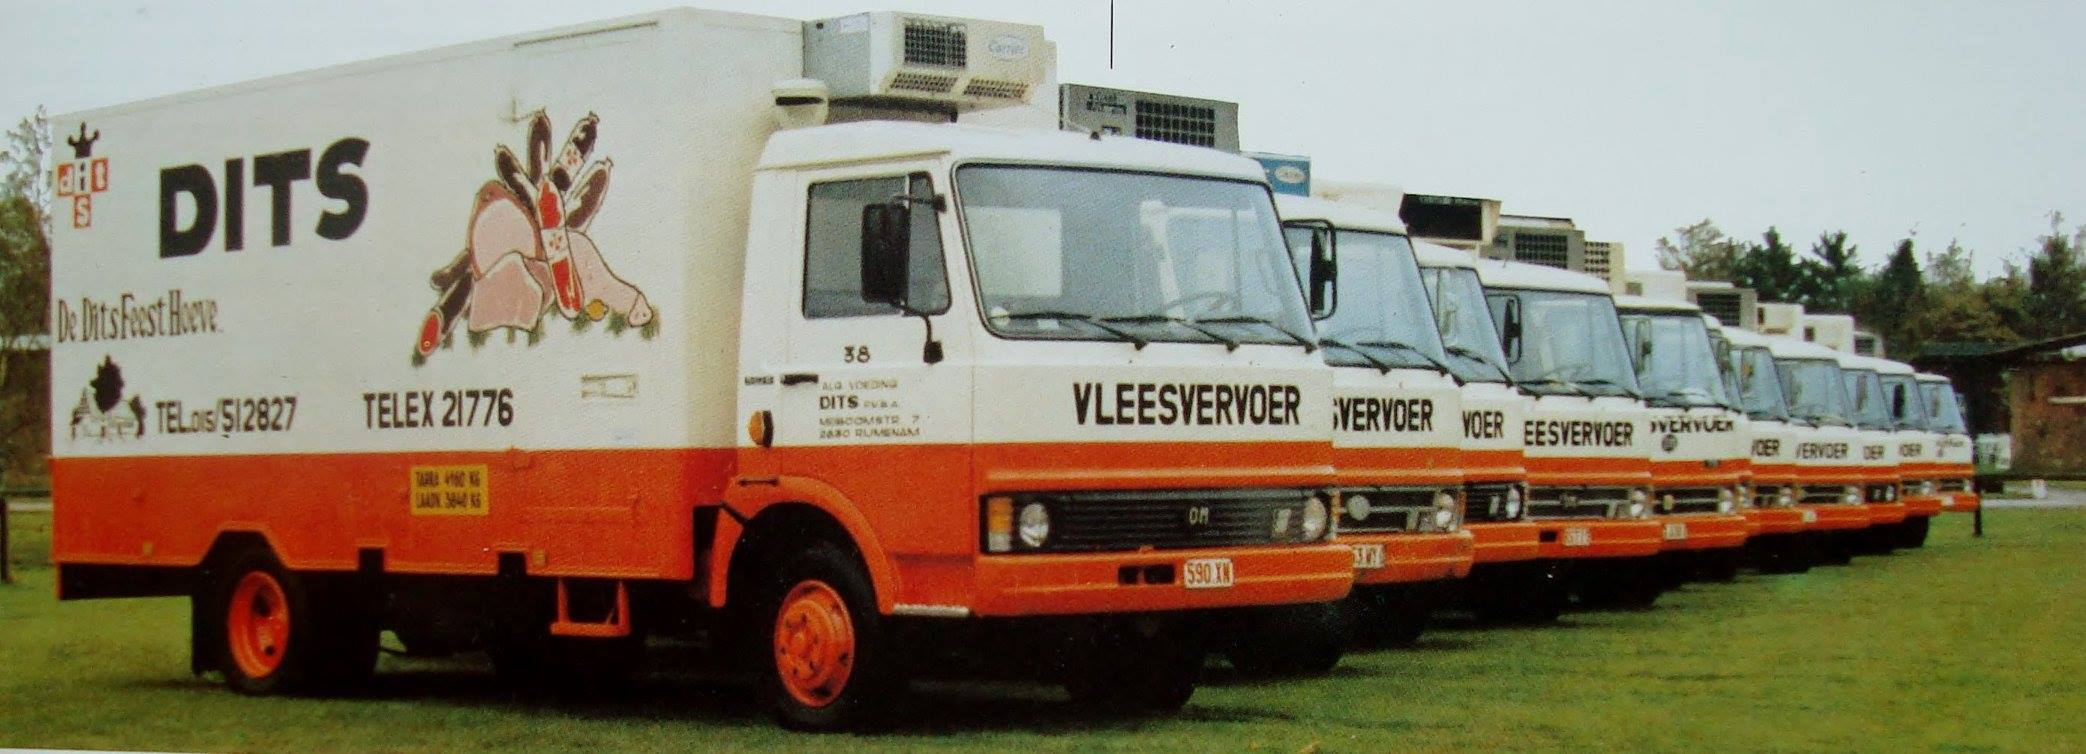 Dits-Vleesvervoer